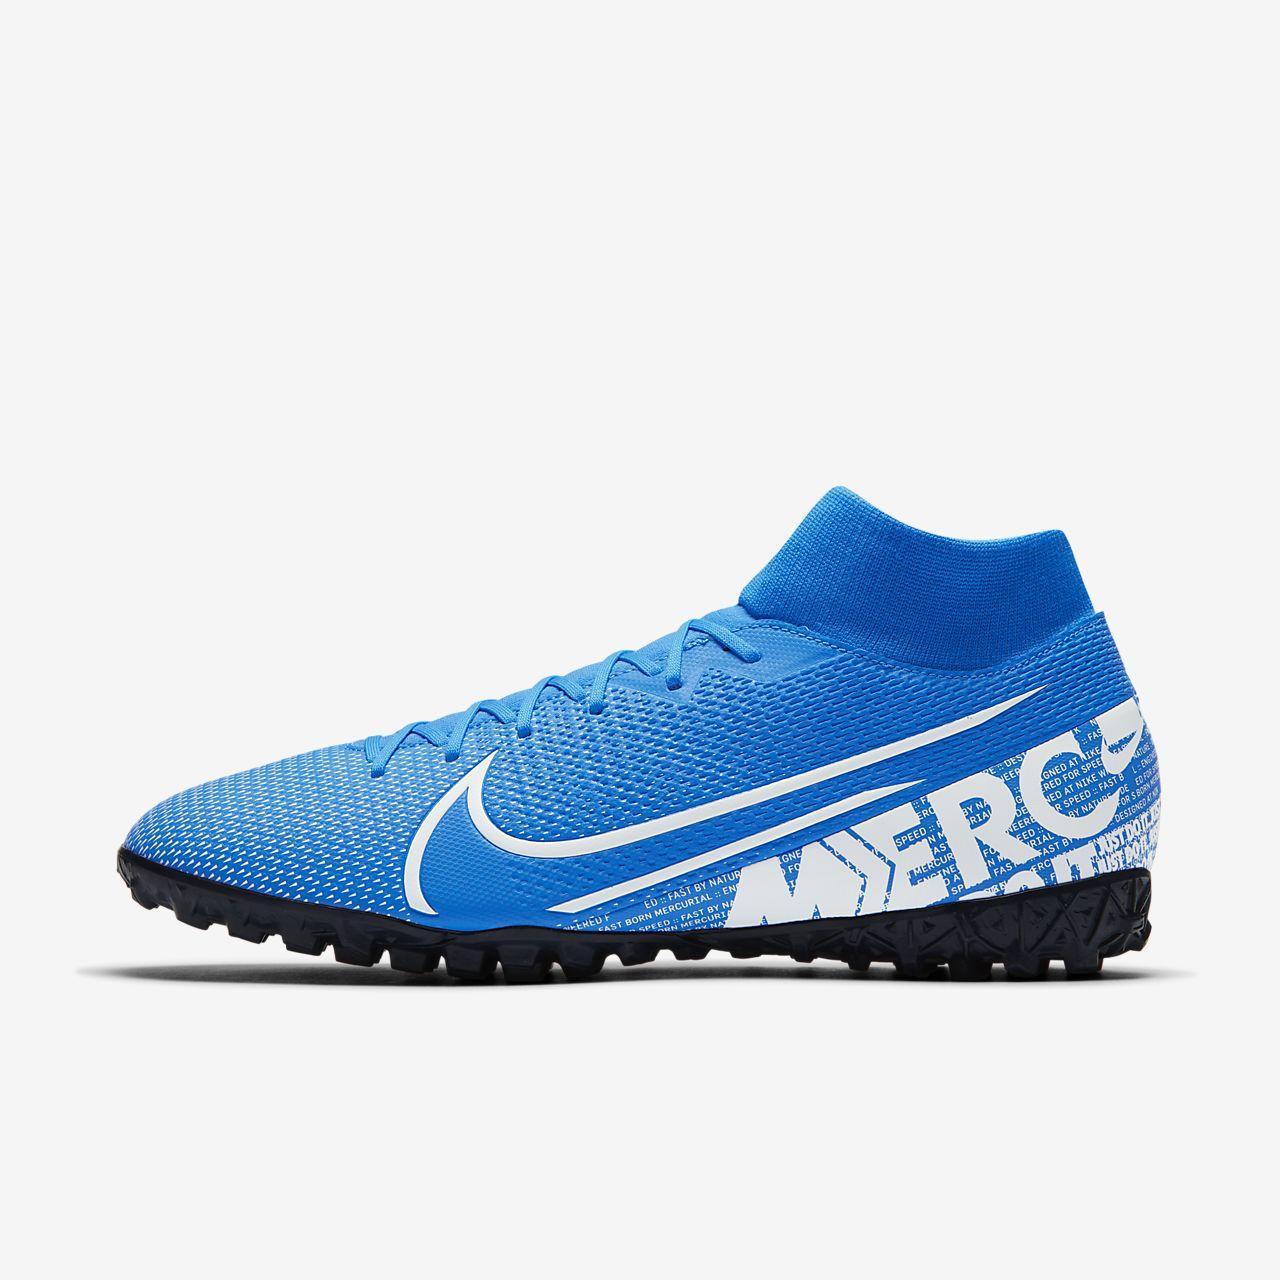 Nike Mercurial Superfly 7 Academy TF Botes de futbol per a terreny artificial i moqueta-turf